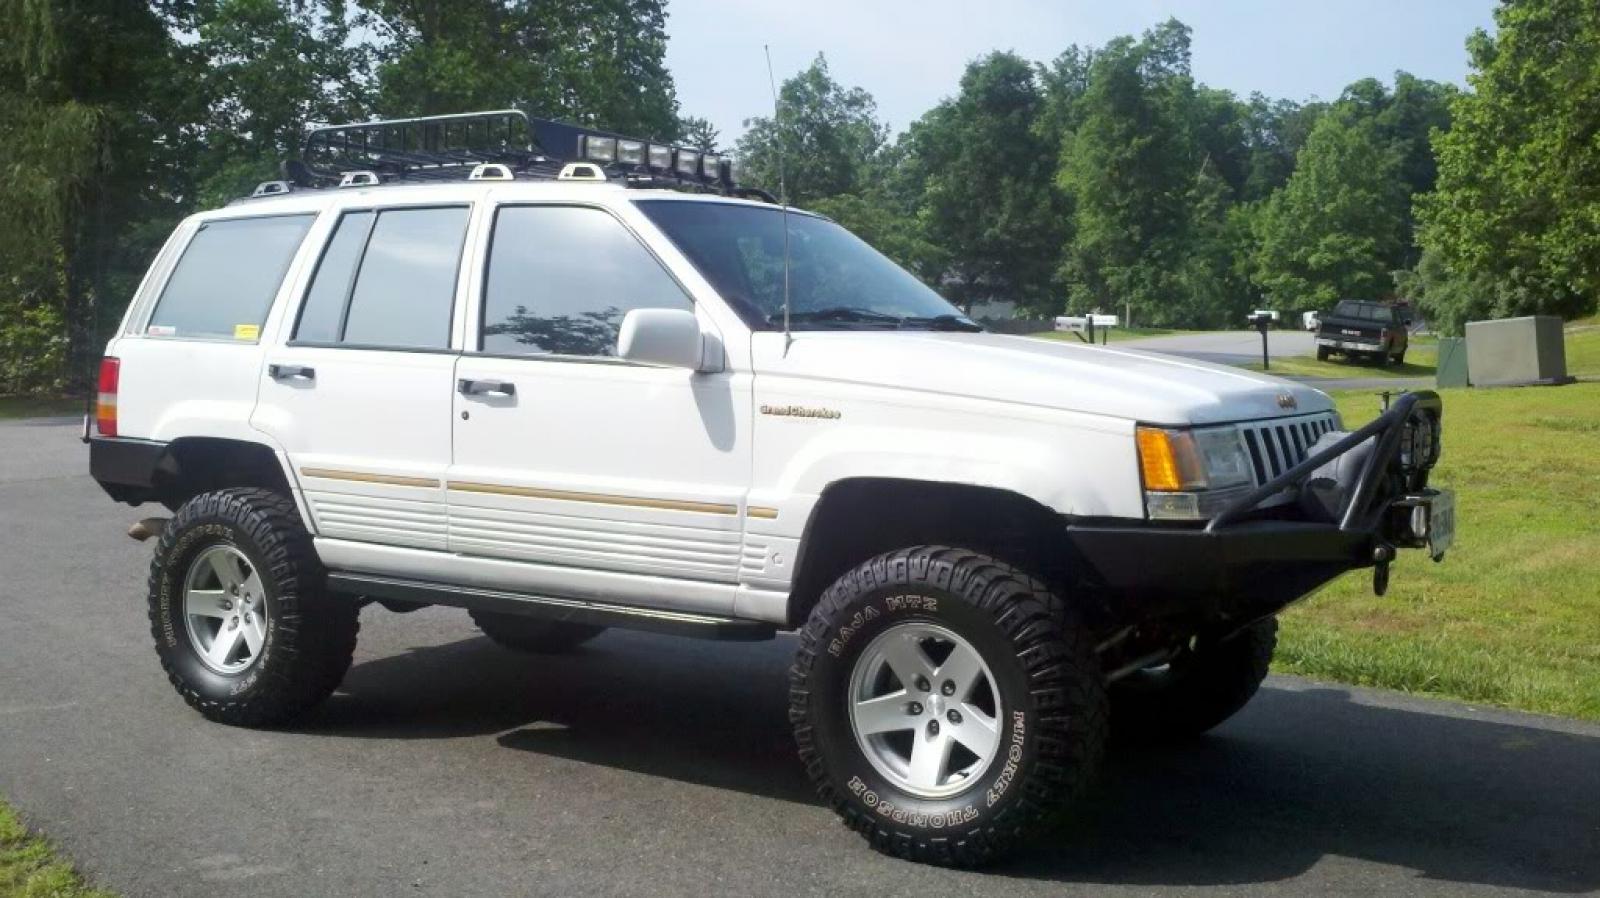 1994 Jeep Grand Cherokee #6 Jeep Grand Cherokee #6 800 1024 1280 1600  origin ...